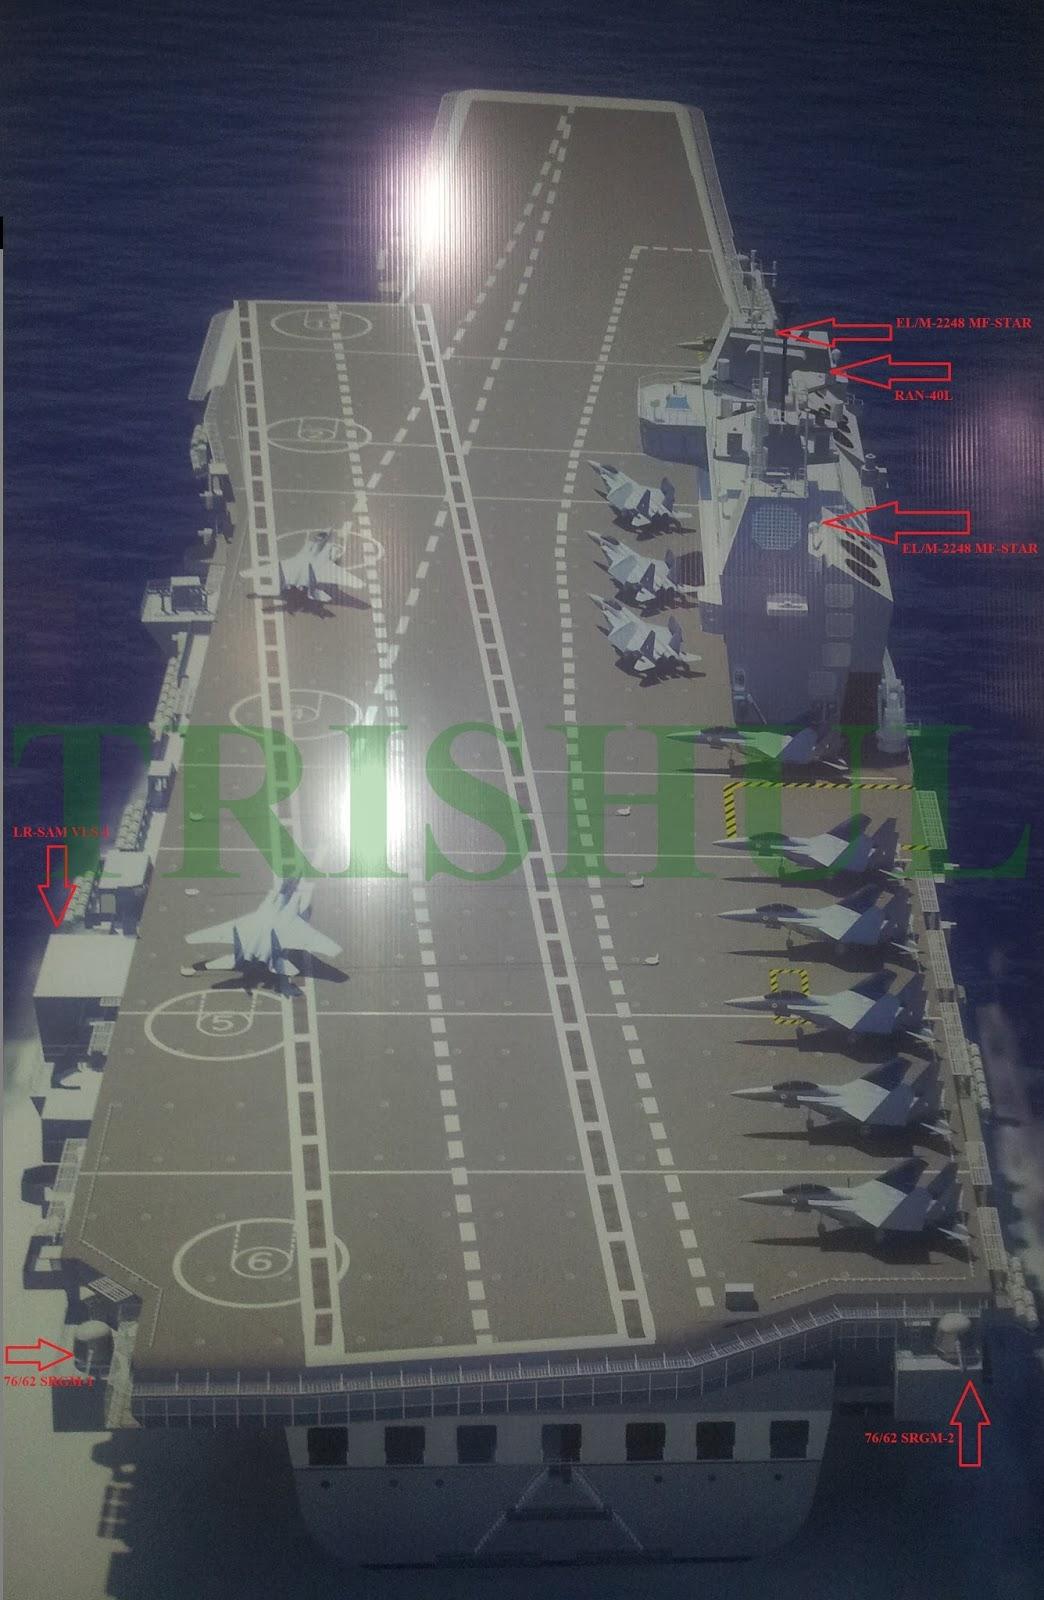 Trishul Sensor Fitments Of Iac 1 Ins Vikrant Amp Ins